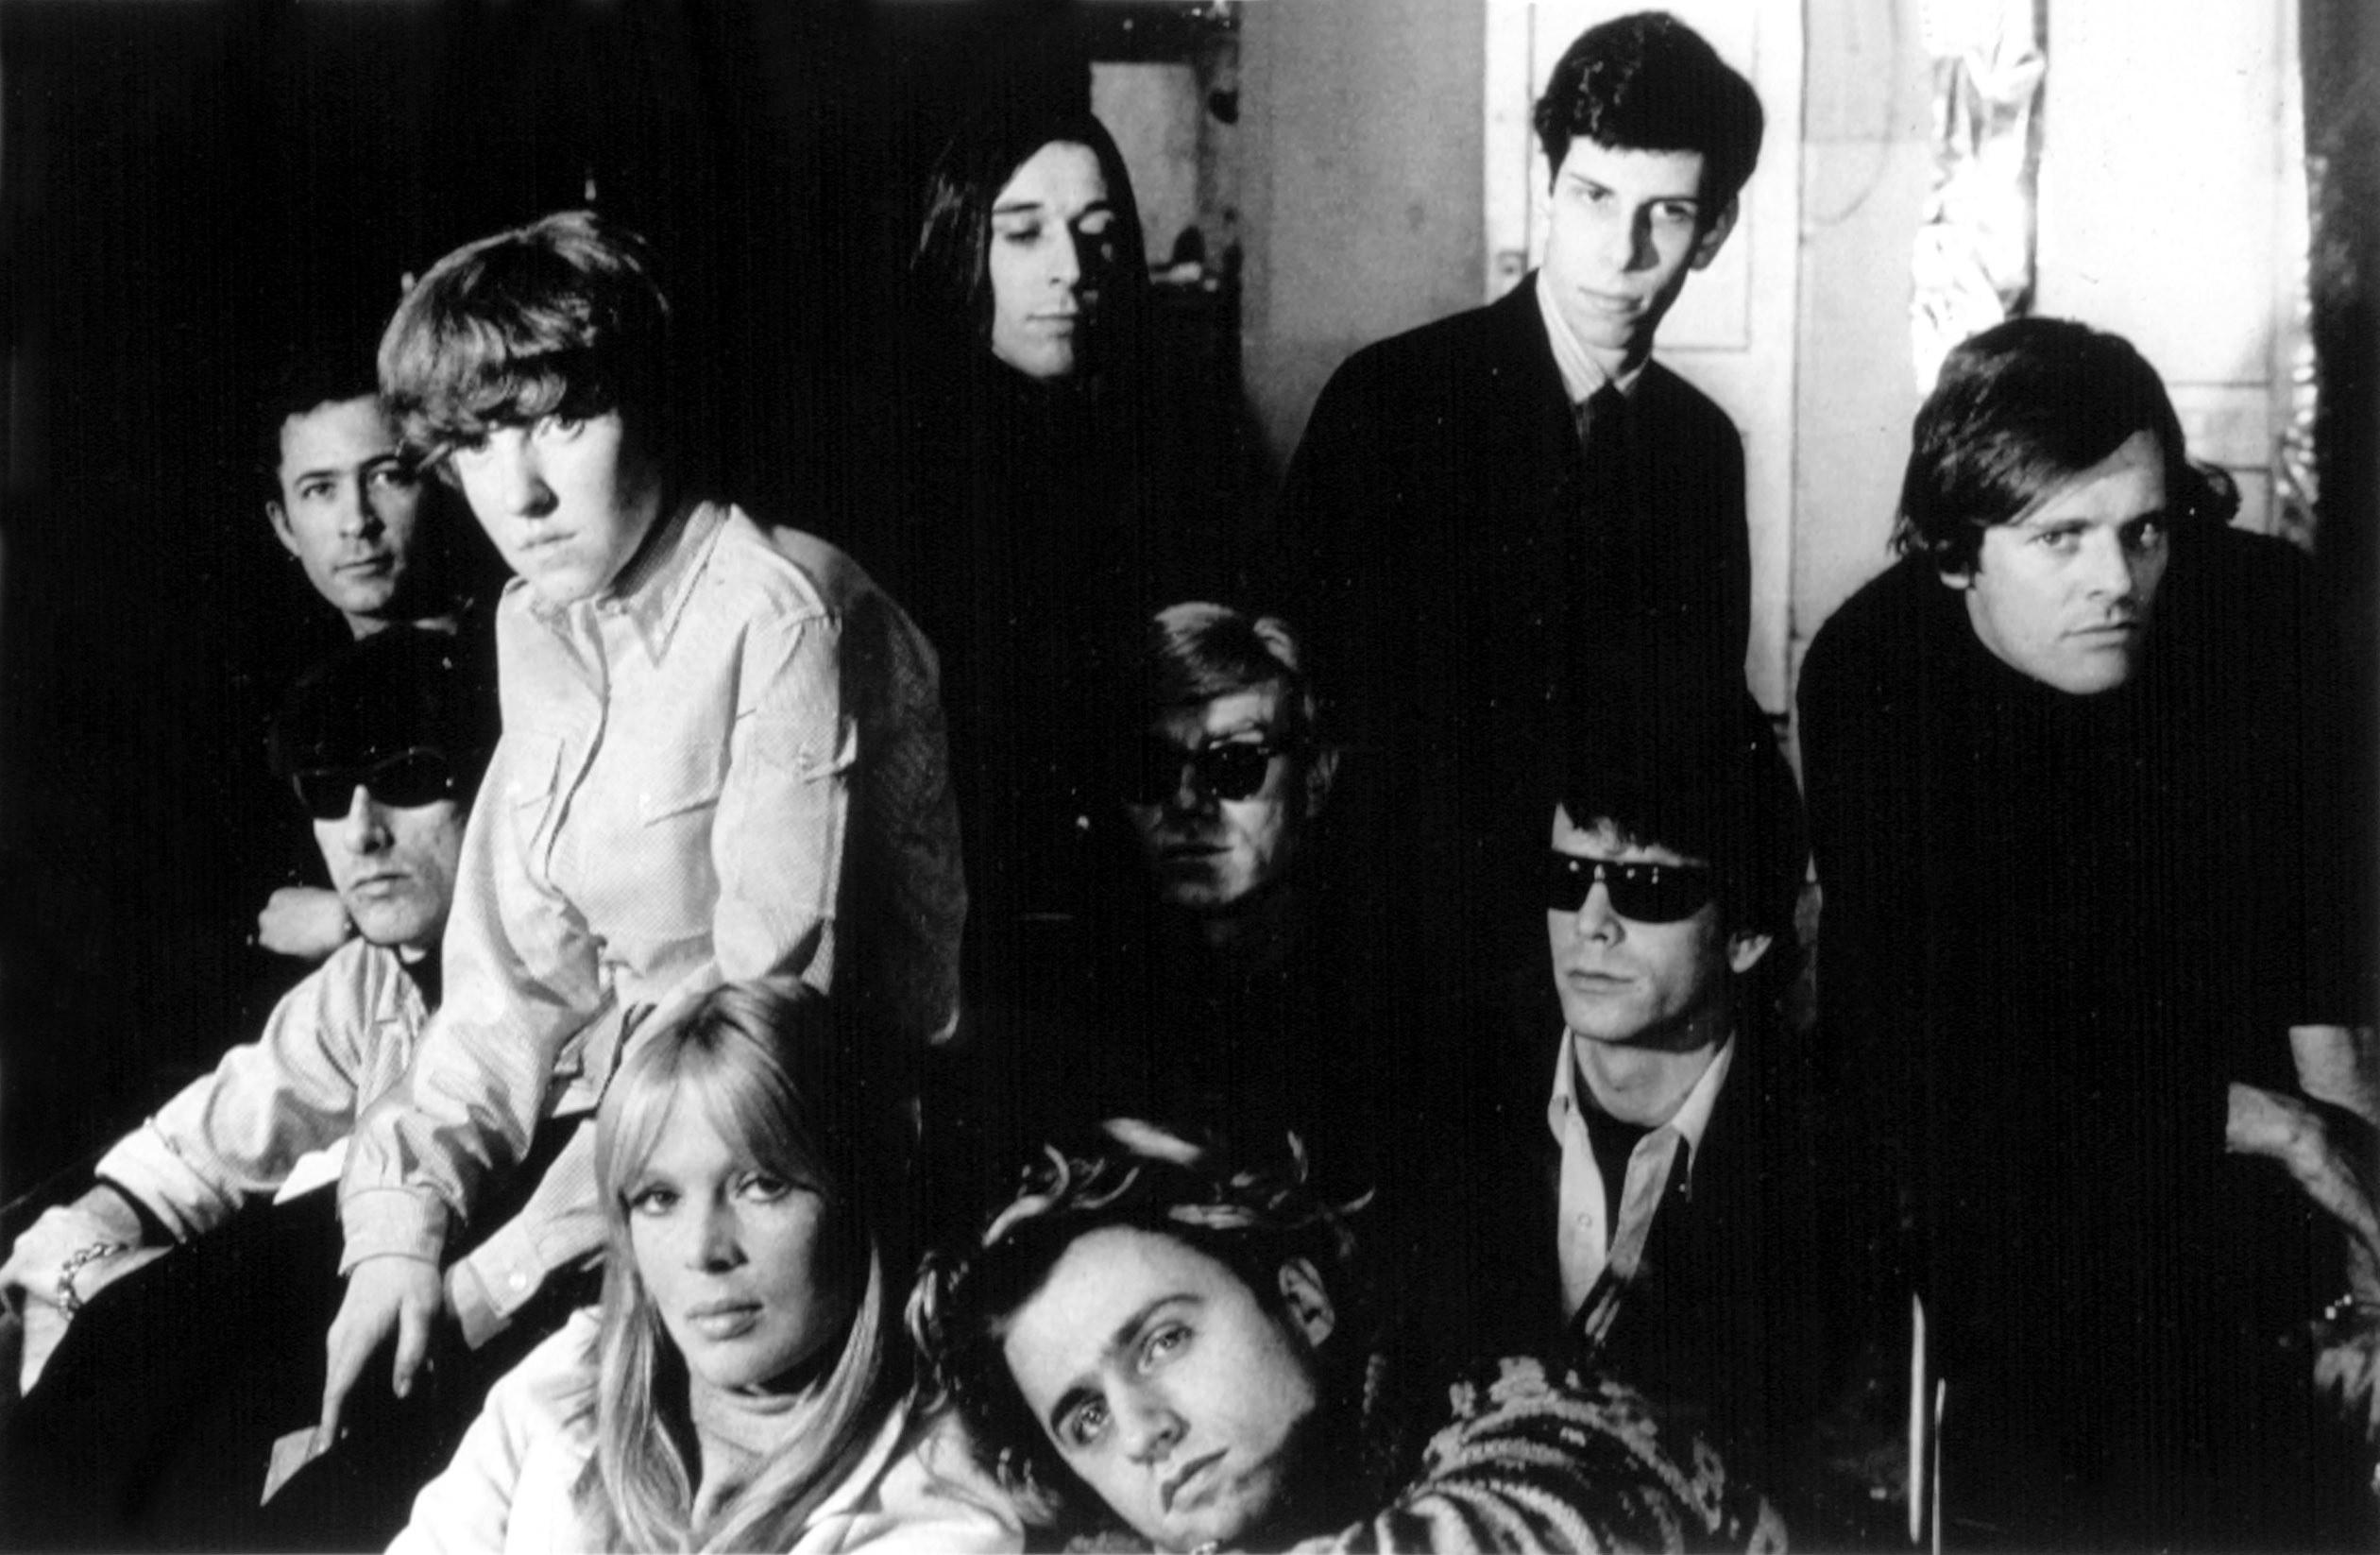 Andy Warhol, Nico, and the Velvet Undergound huddled together